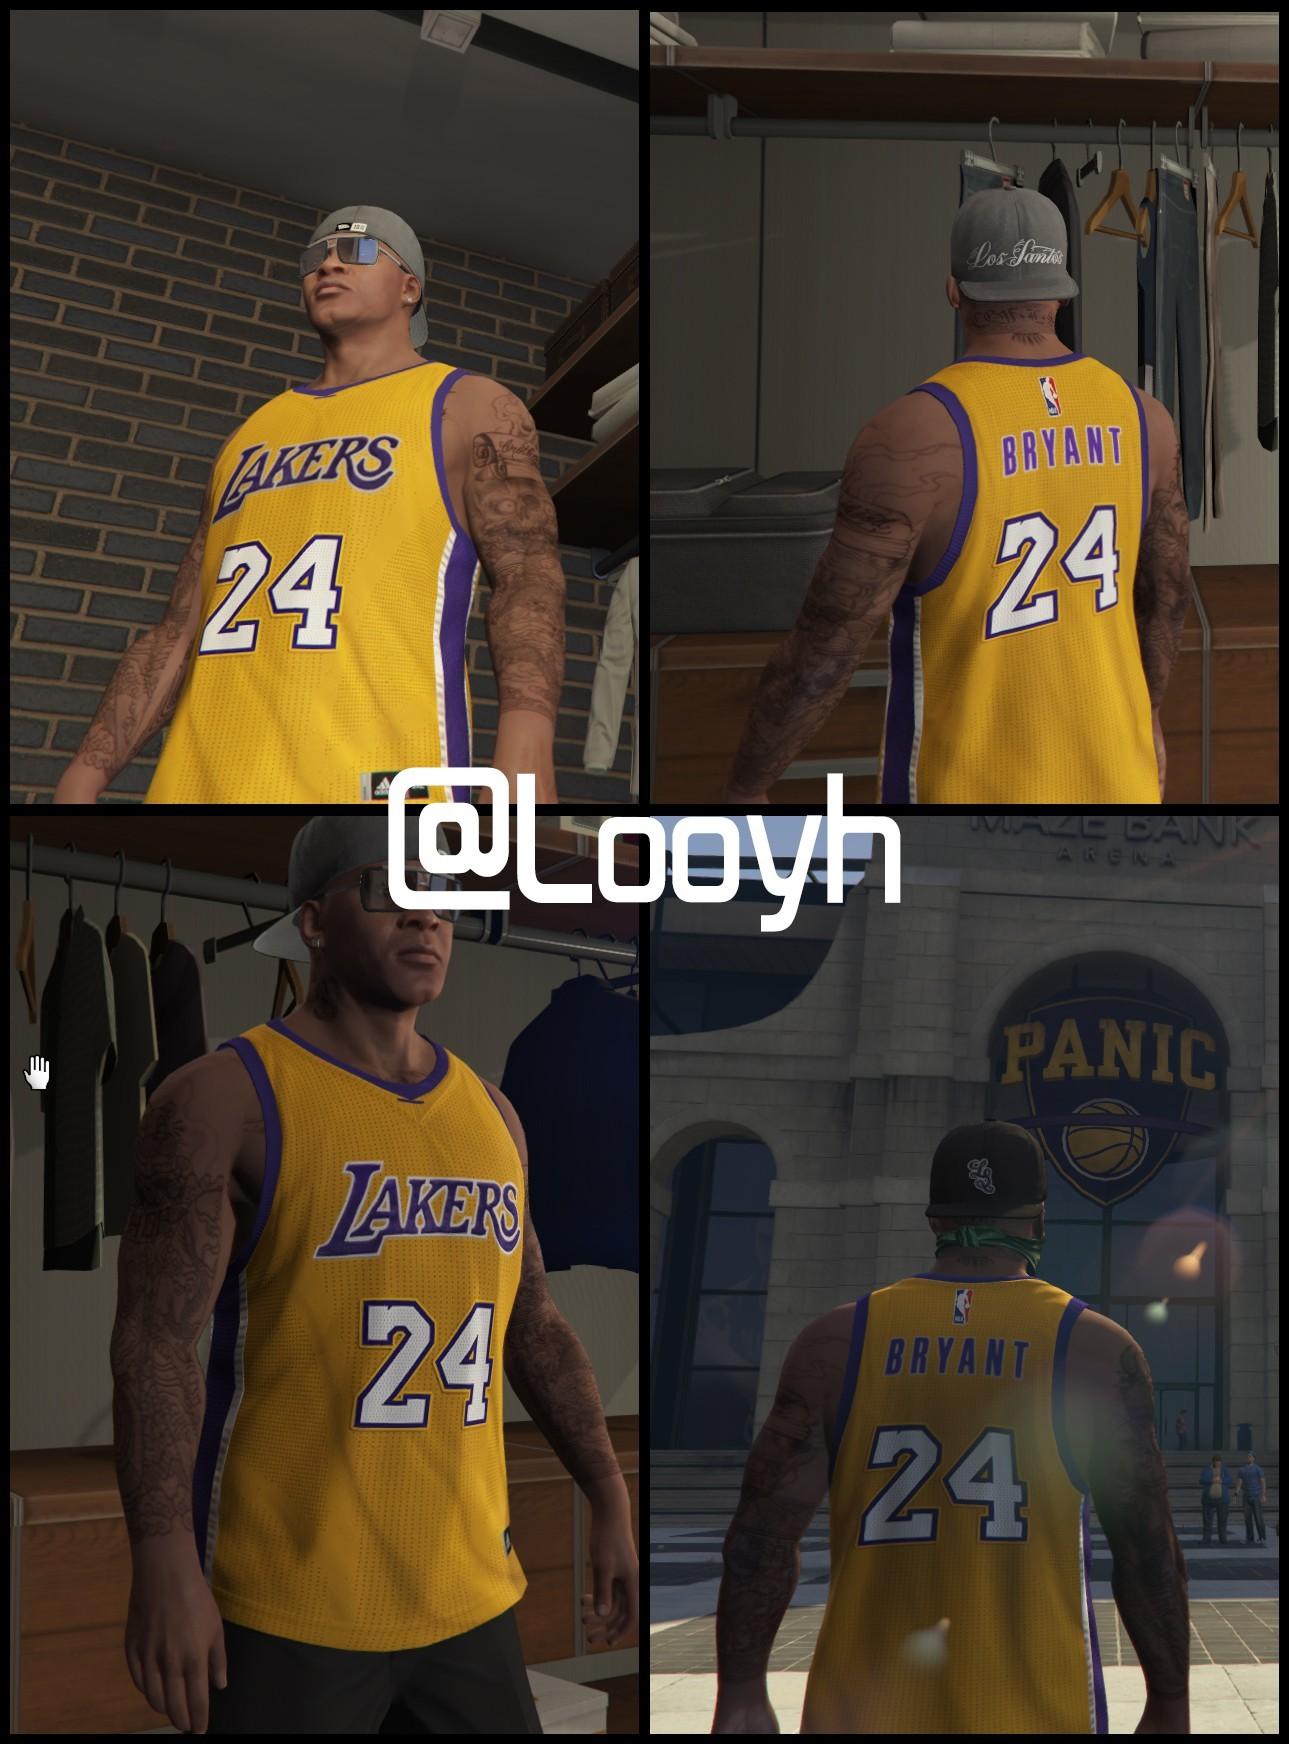 Lakers Kobe Bryant 24 Jersey